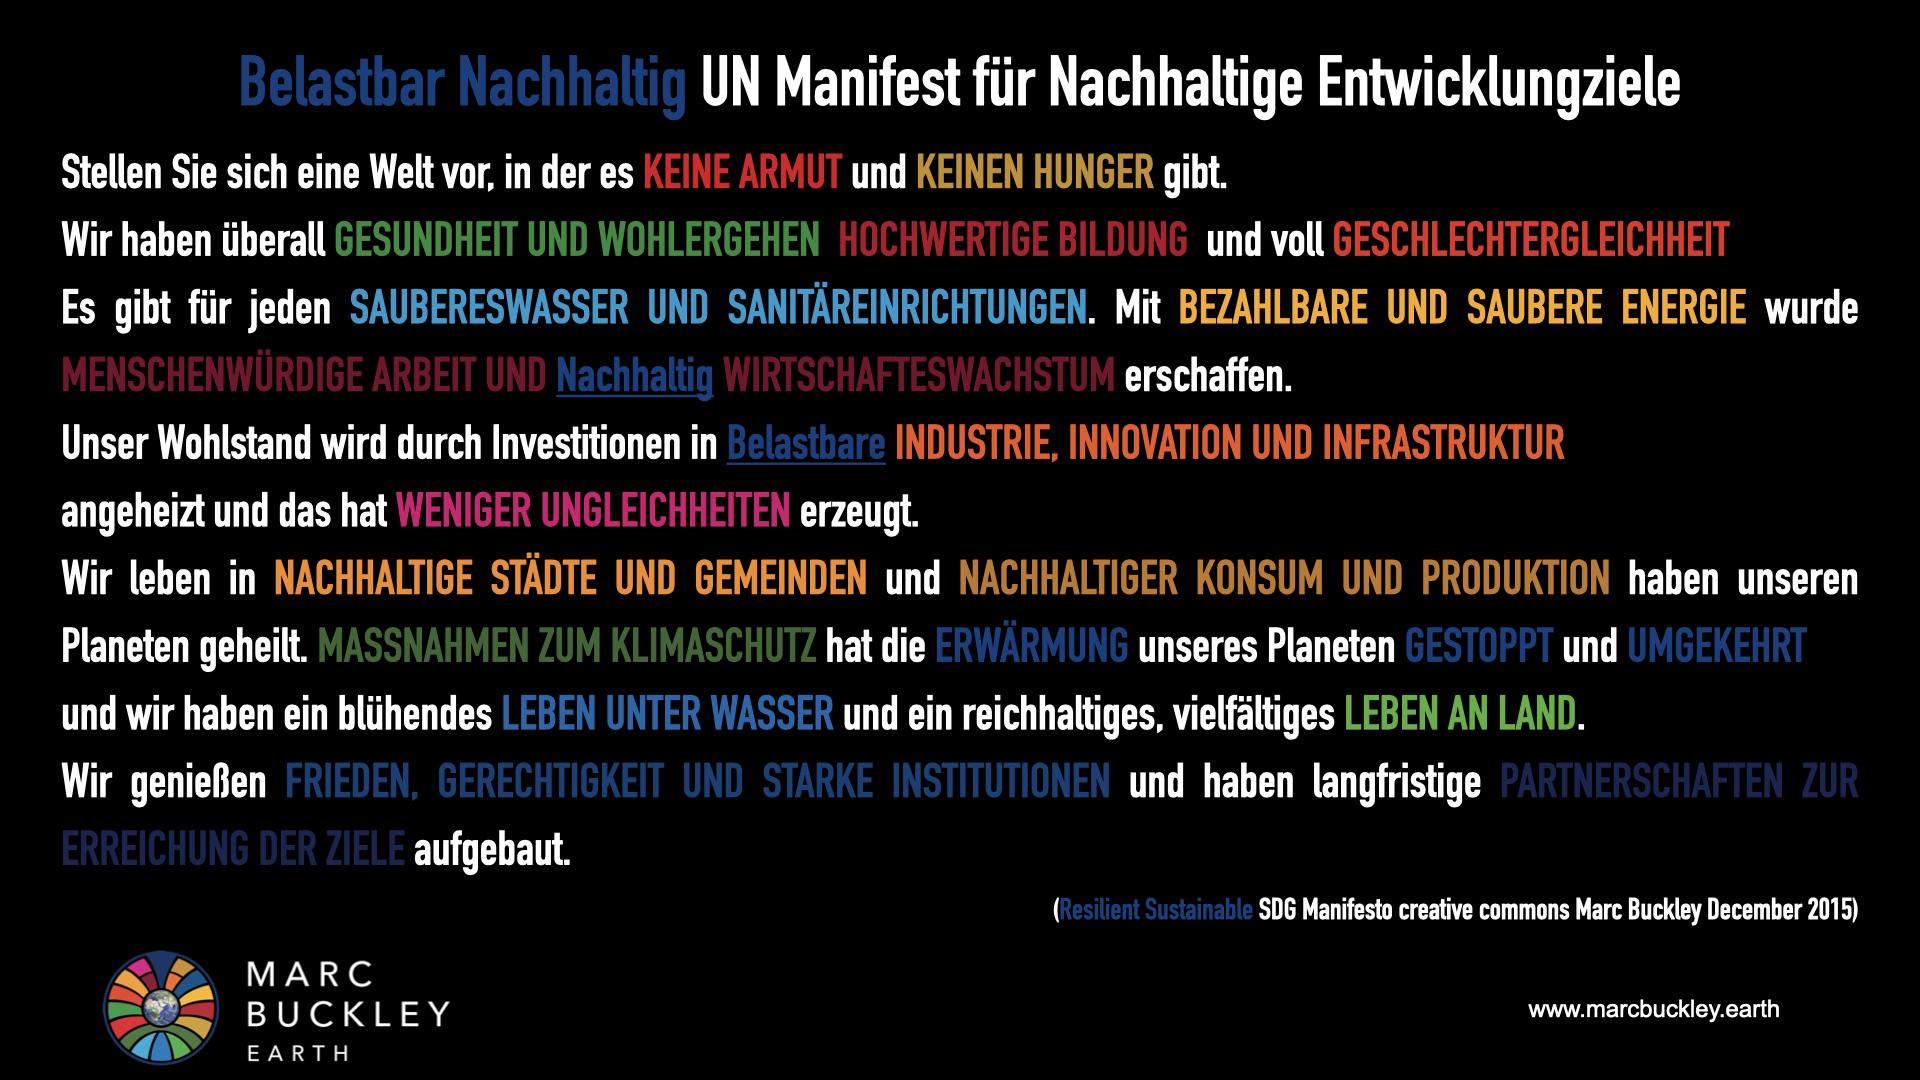 German SDG Manifesto Black